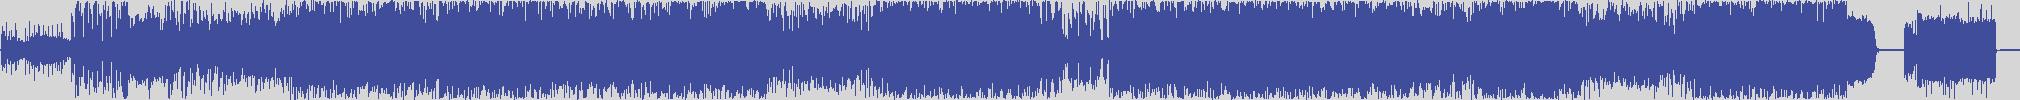 nd_recordz [NDR001] Axhel, Chrono - N.c.i. [Original] audio wave form